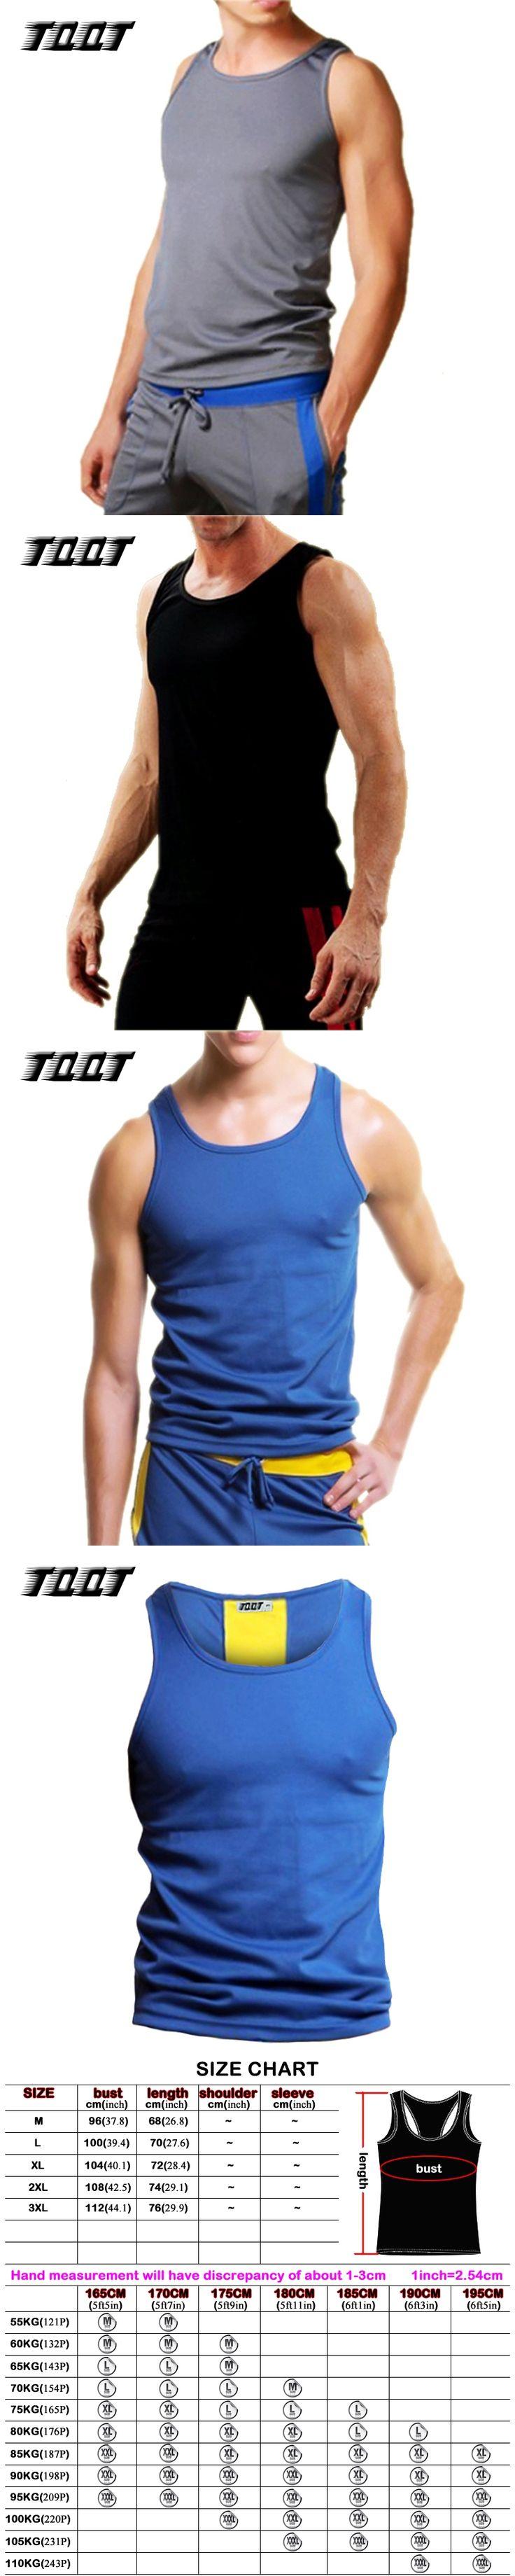 TQQT mens tank tops elastic vest slim undershirts summer vests men fitness solid tank tops patchwork gyms vest 5 colours 5J0430